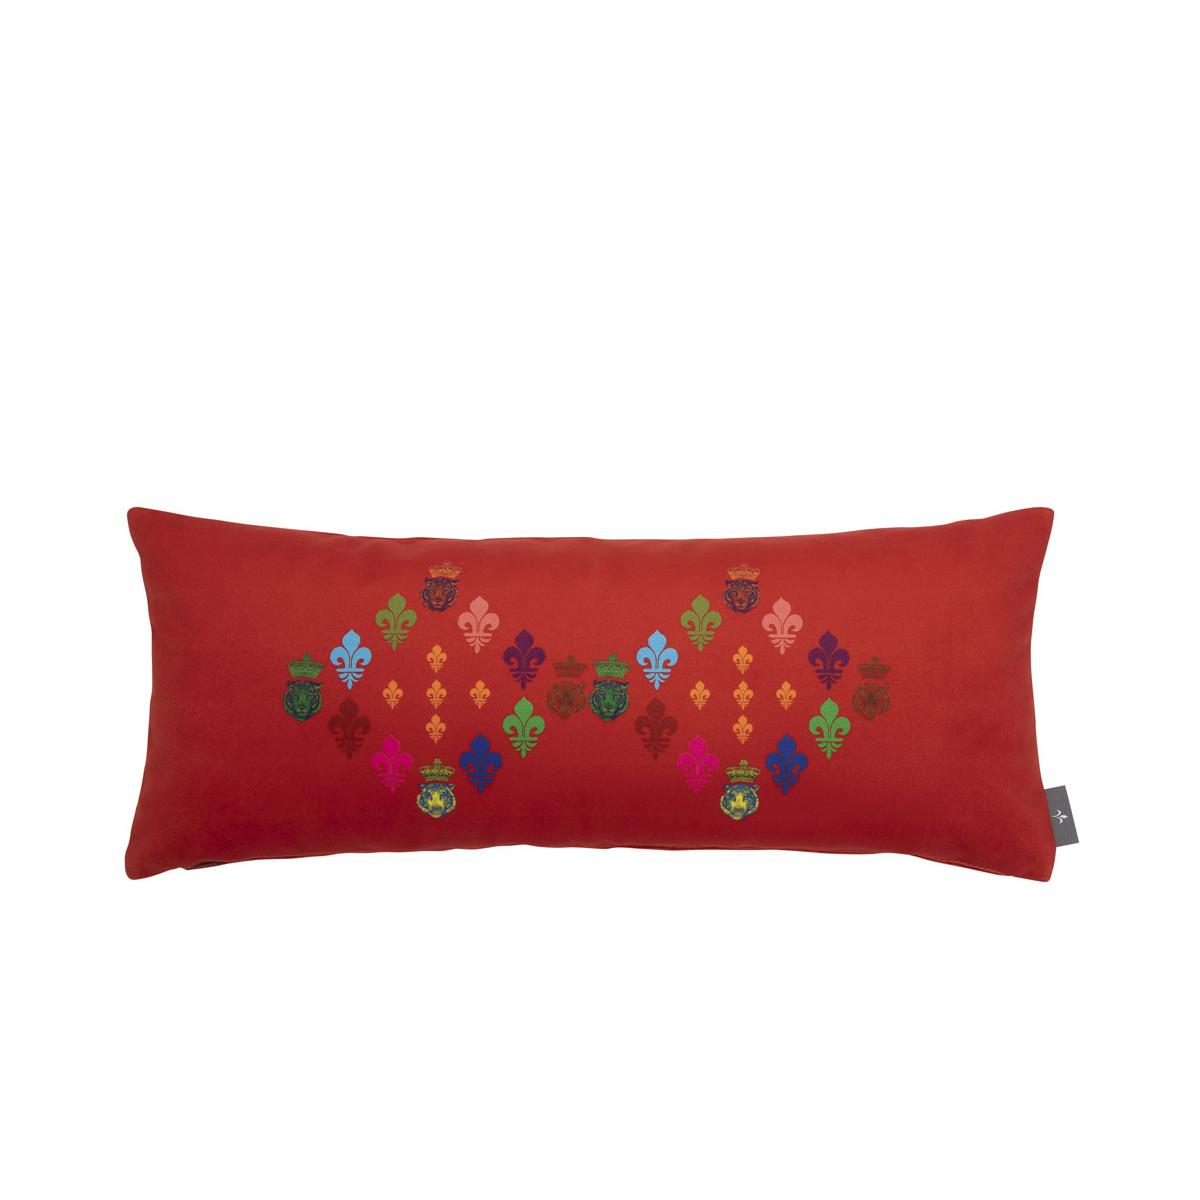 Coussin lys imprimé sur velours made in france rouge 25x60